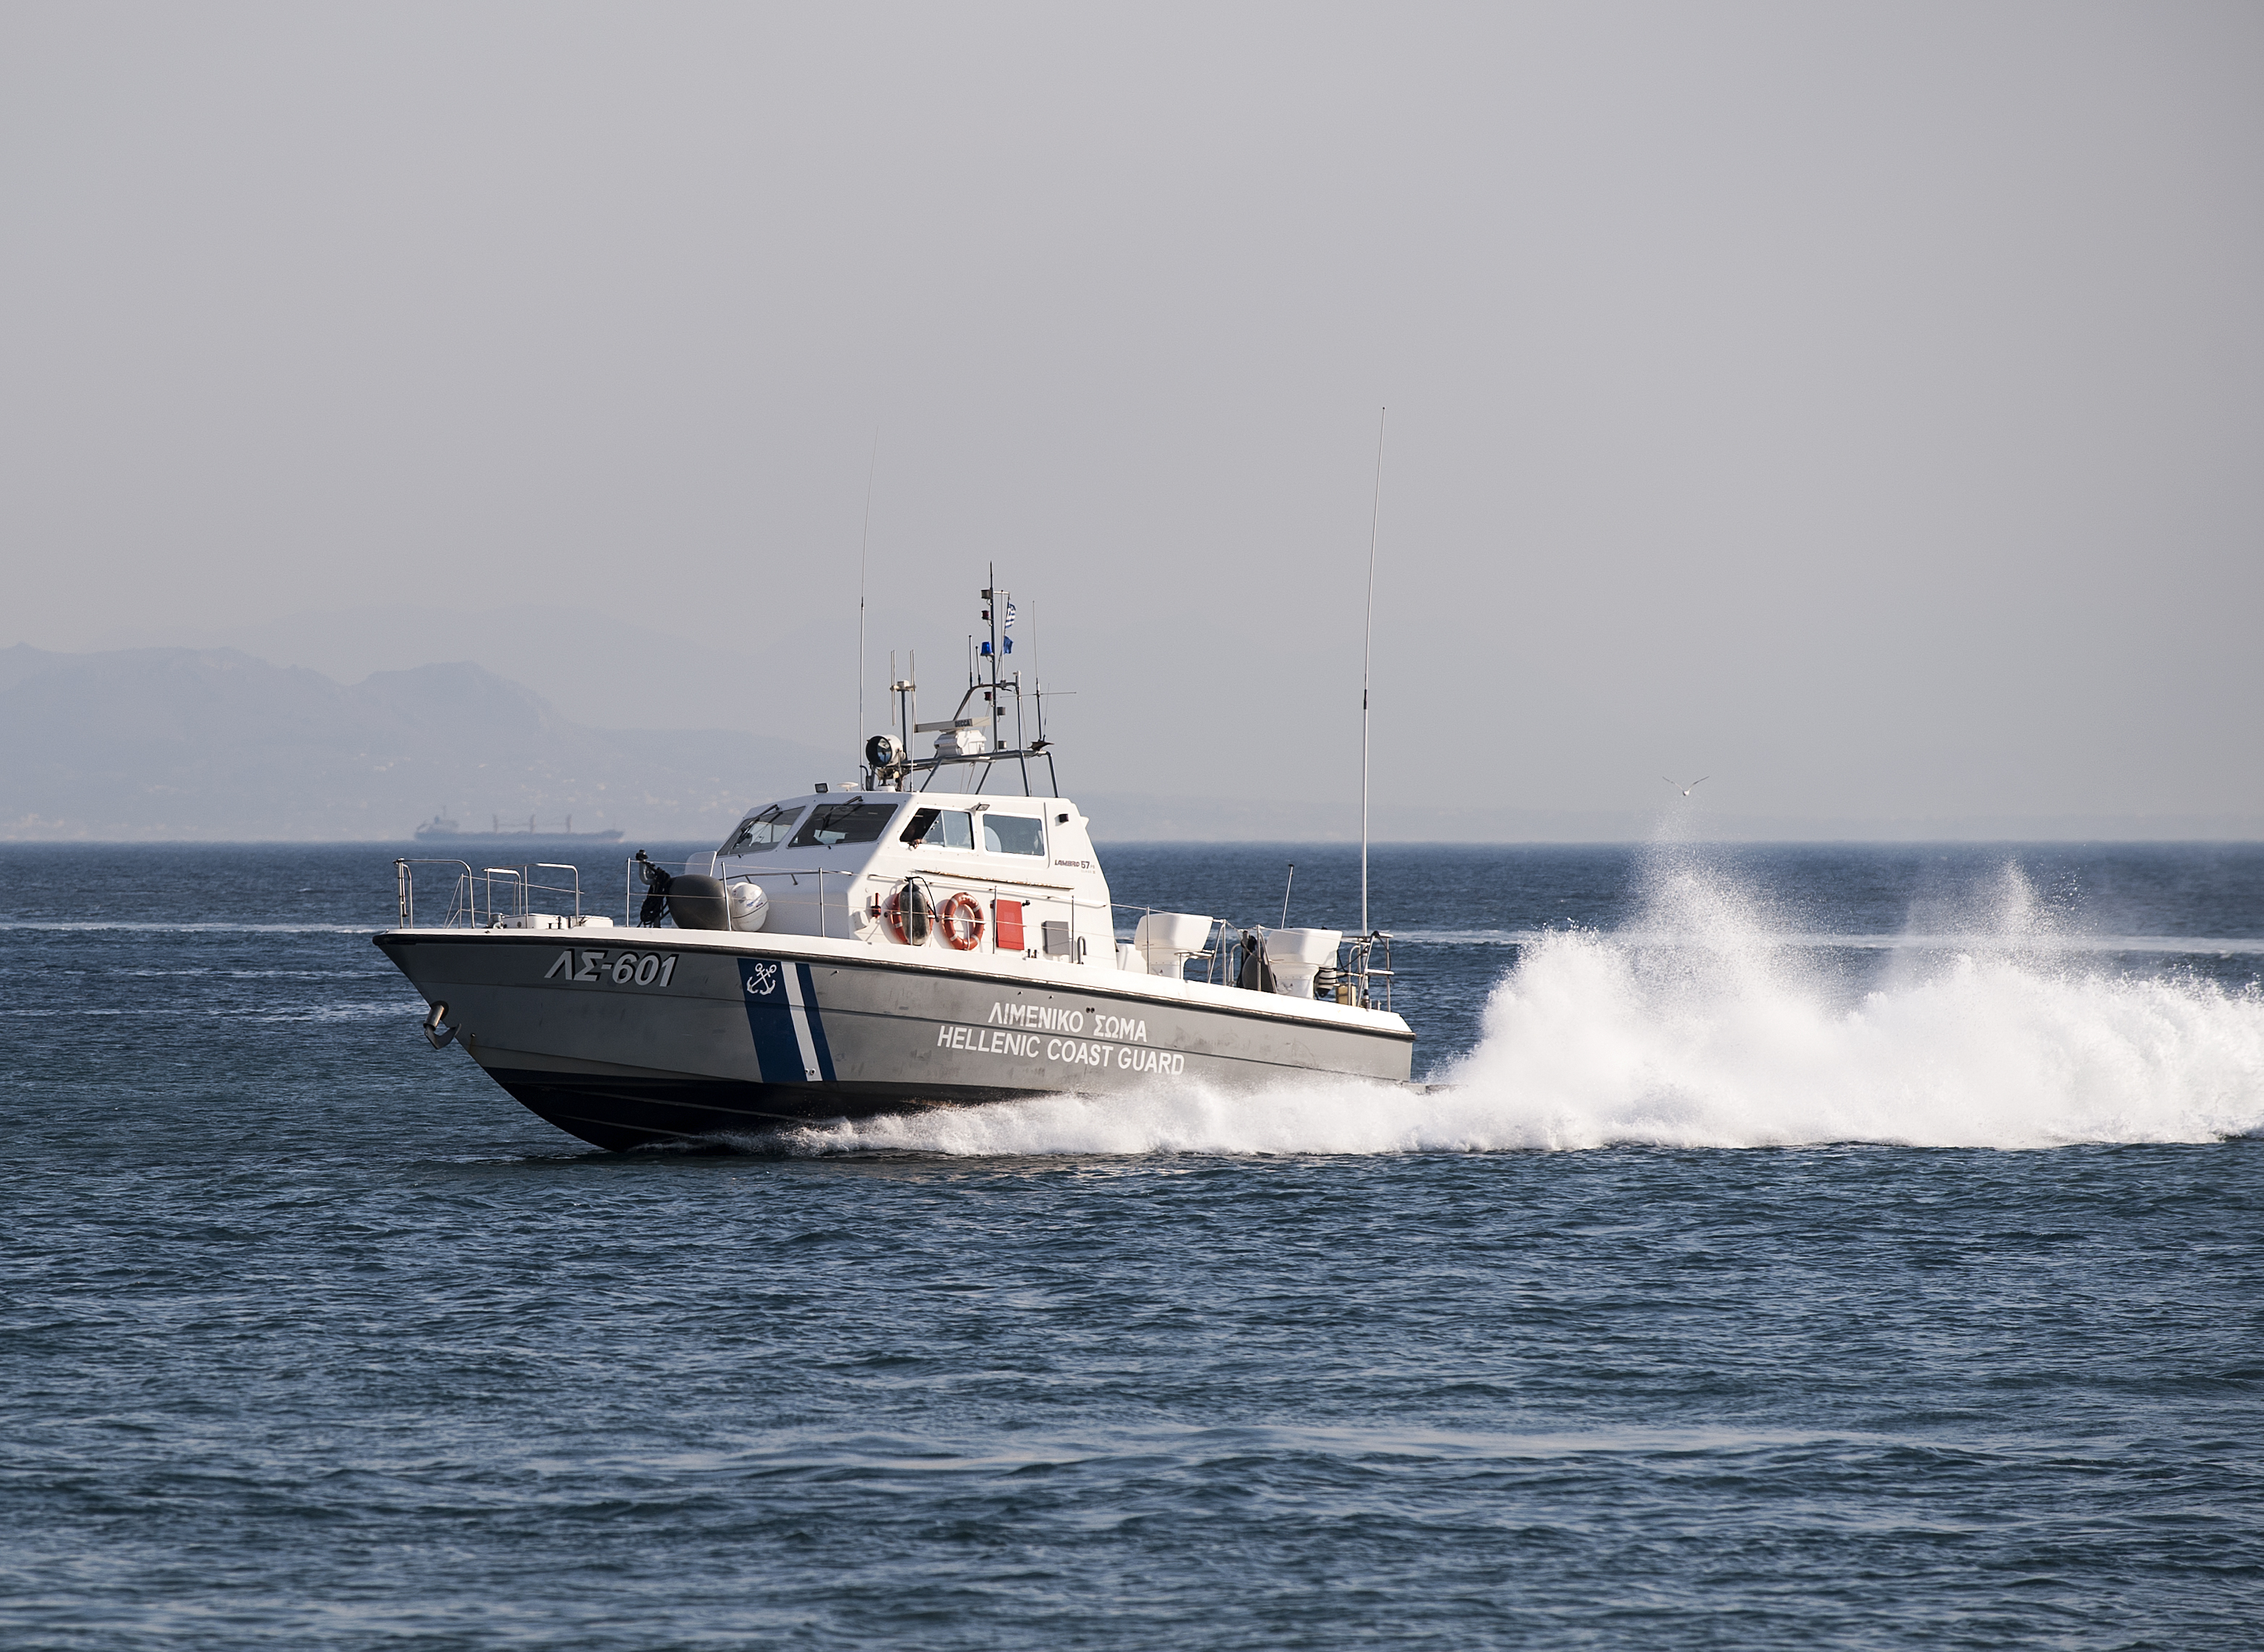 Garde-côtes en Grèce © Kostas Koutsaftikis / Shutterstock.com